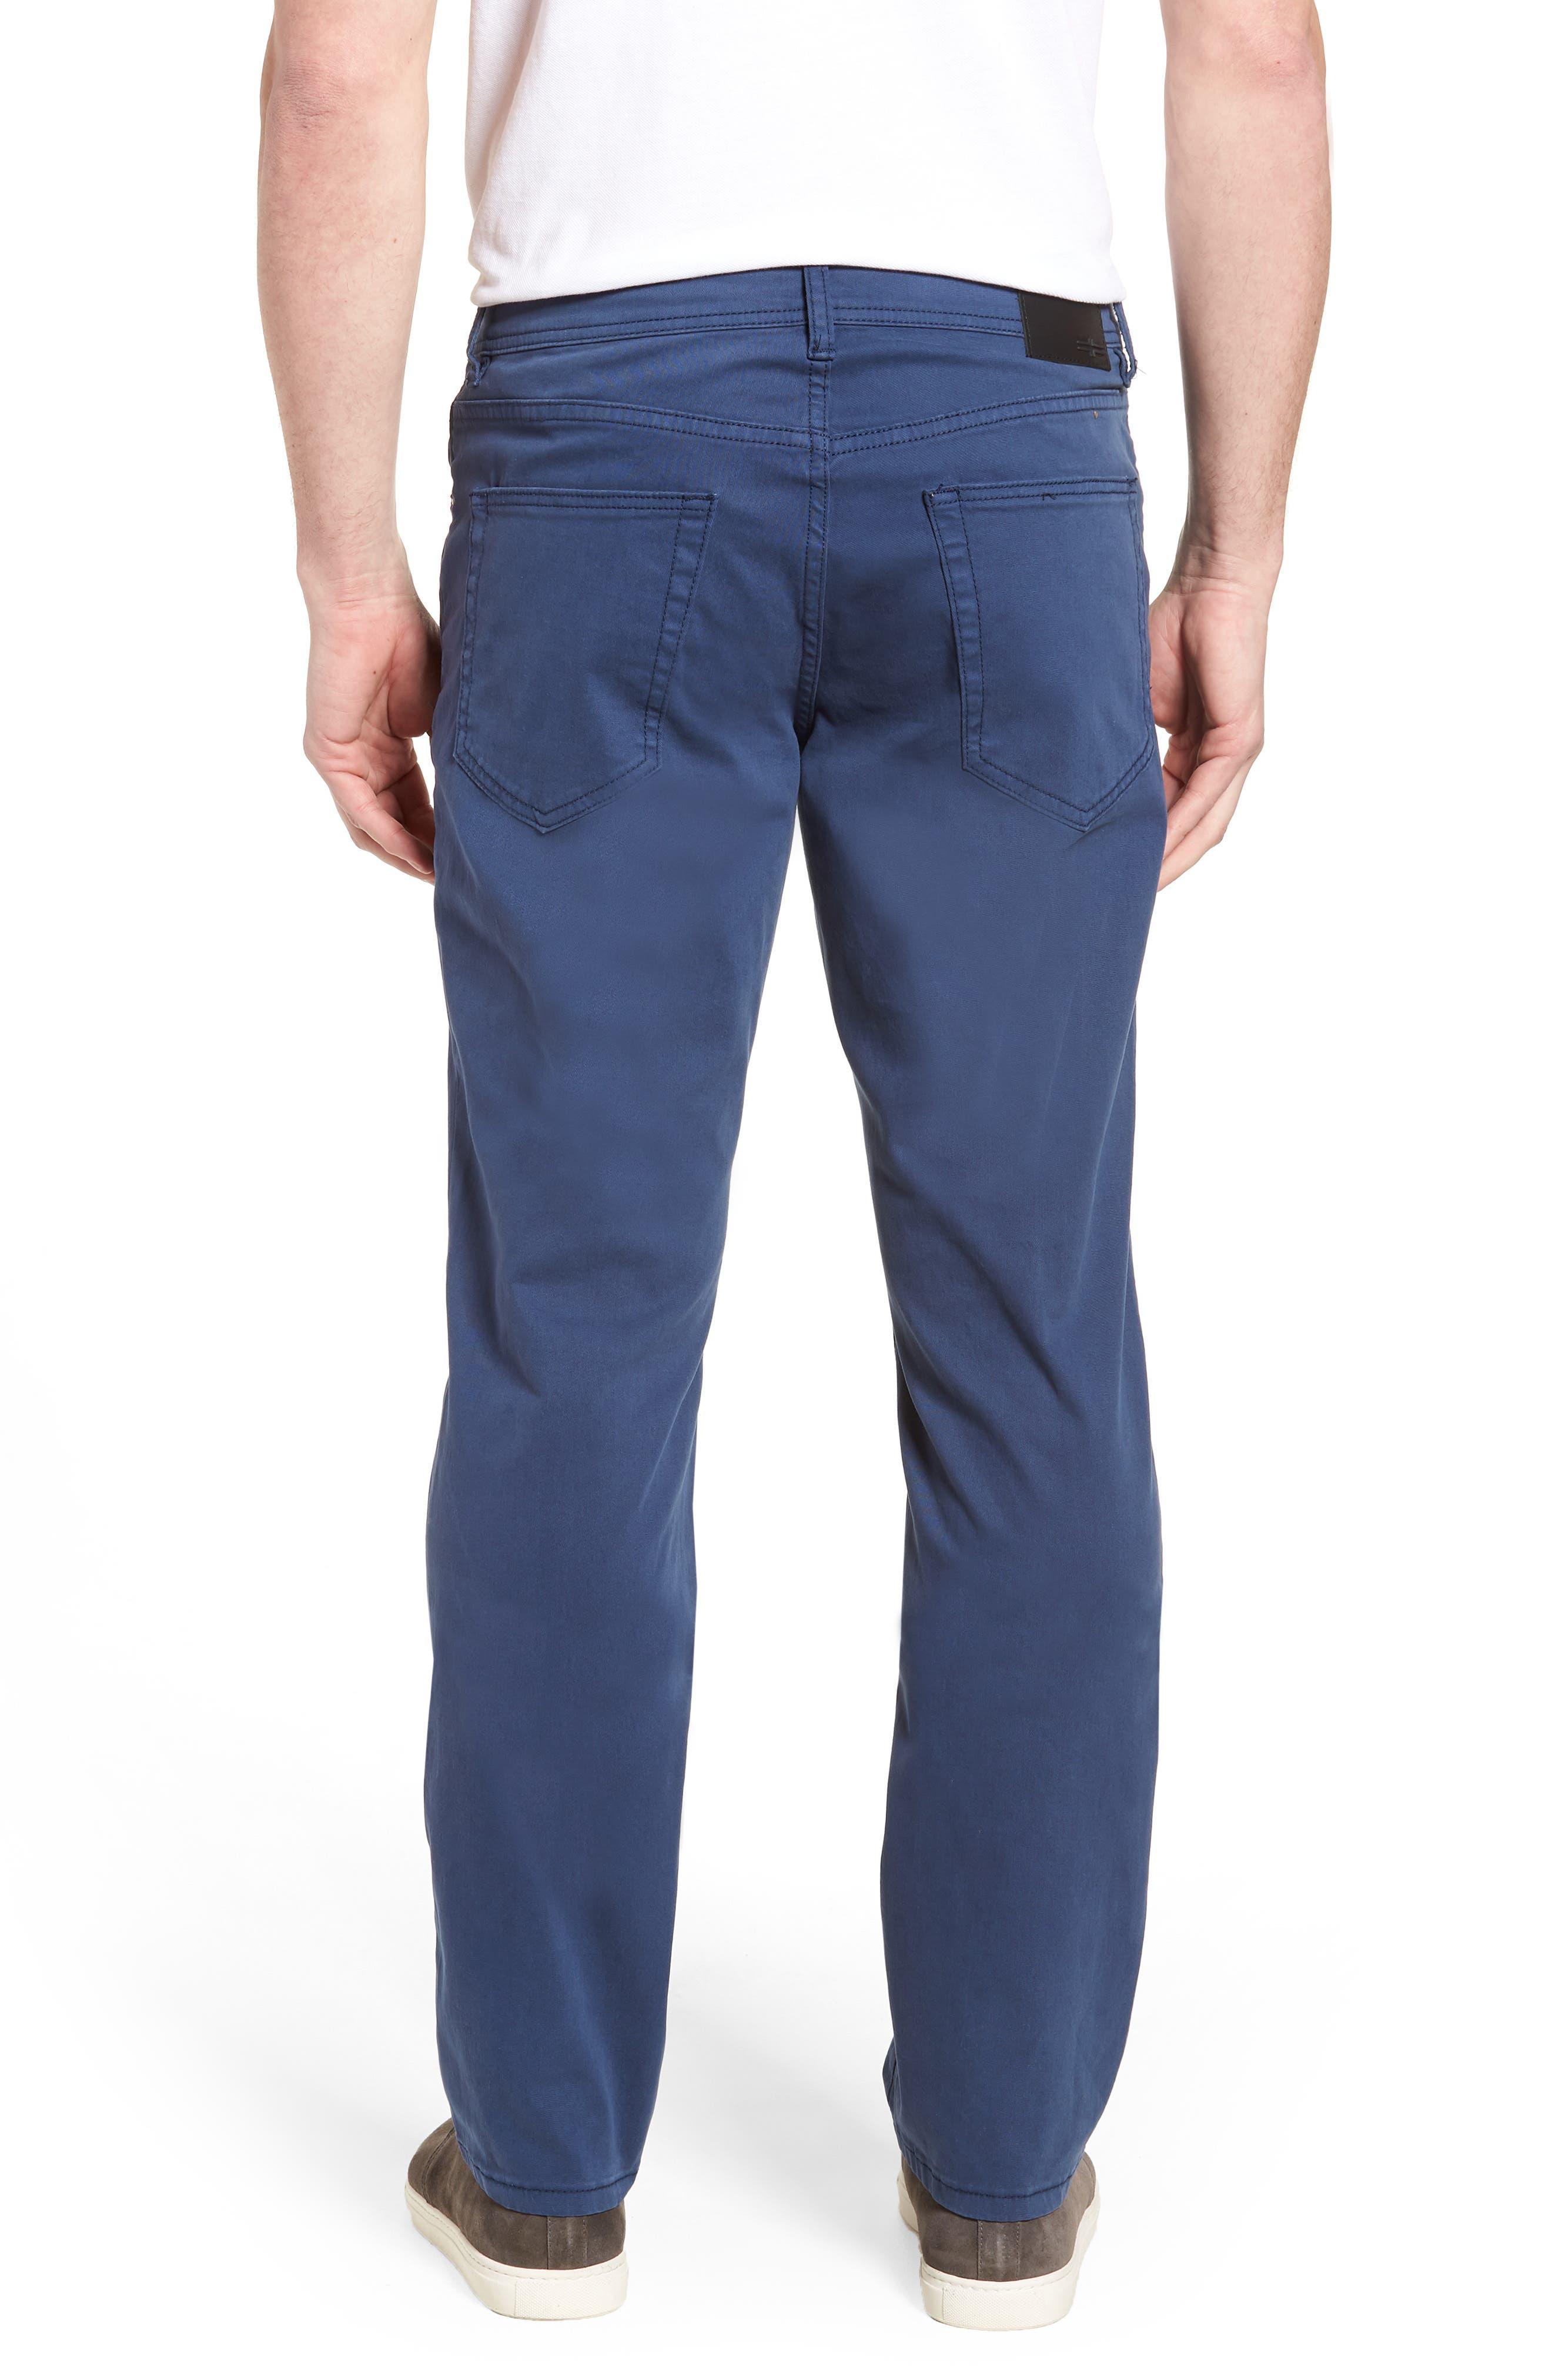 Jeans Co. Regent Relaxed Straight Leg Jeans,                             Alternate thumbnail 2, color,                             BLUE TWILIGHT